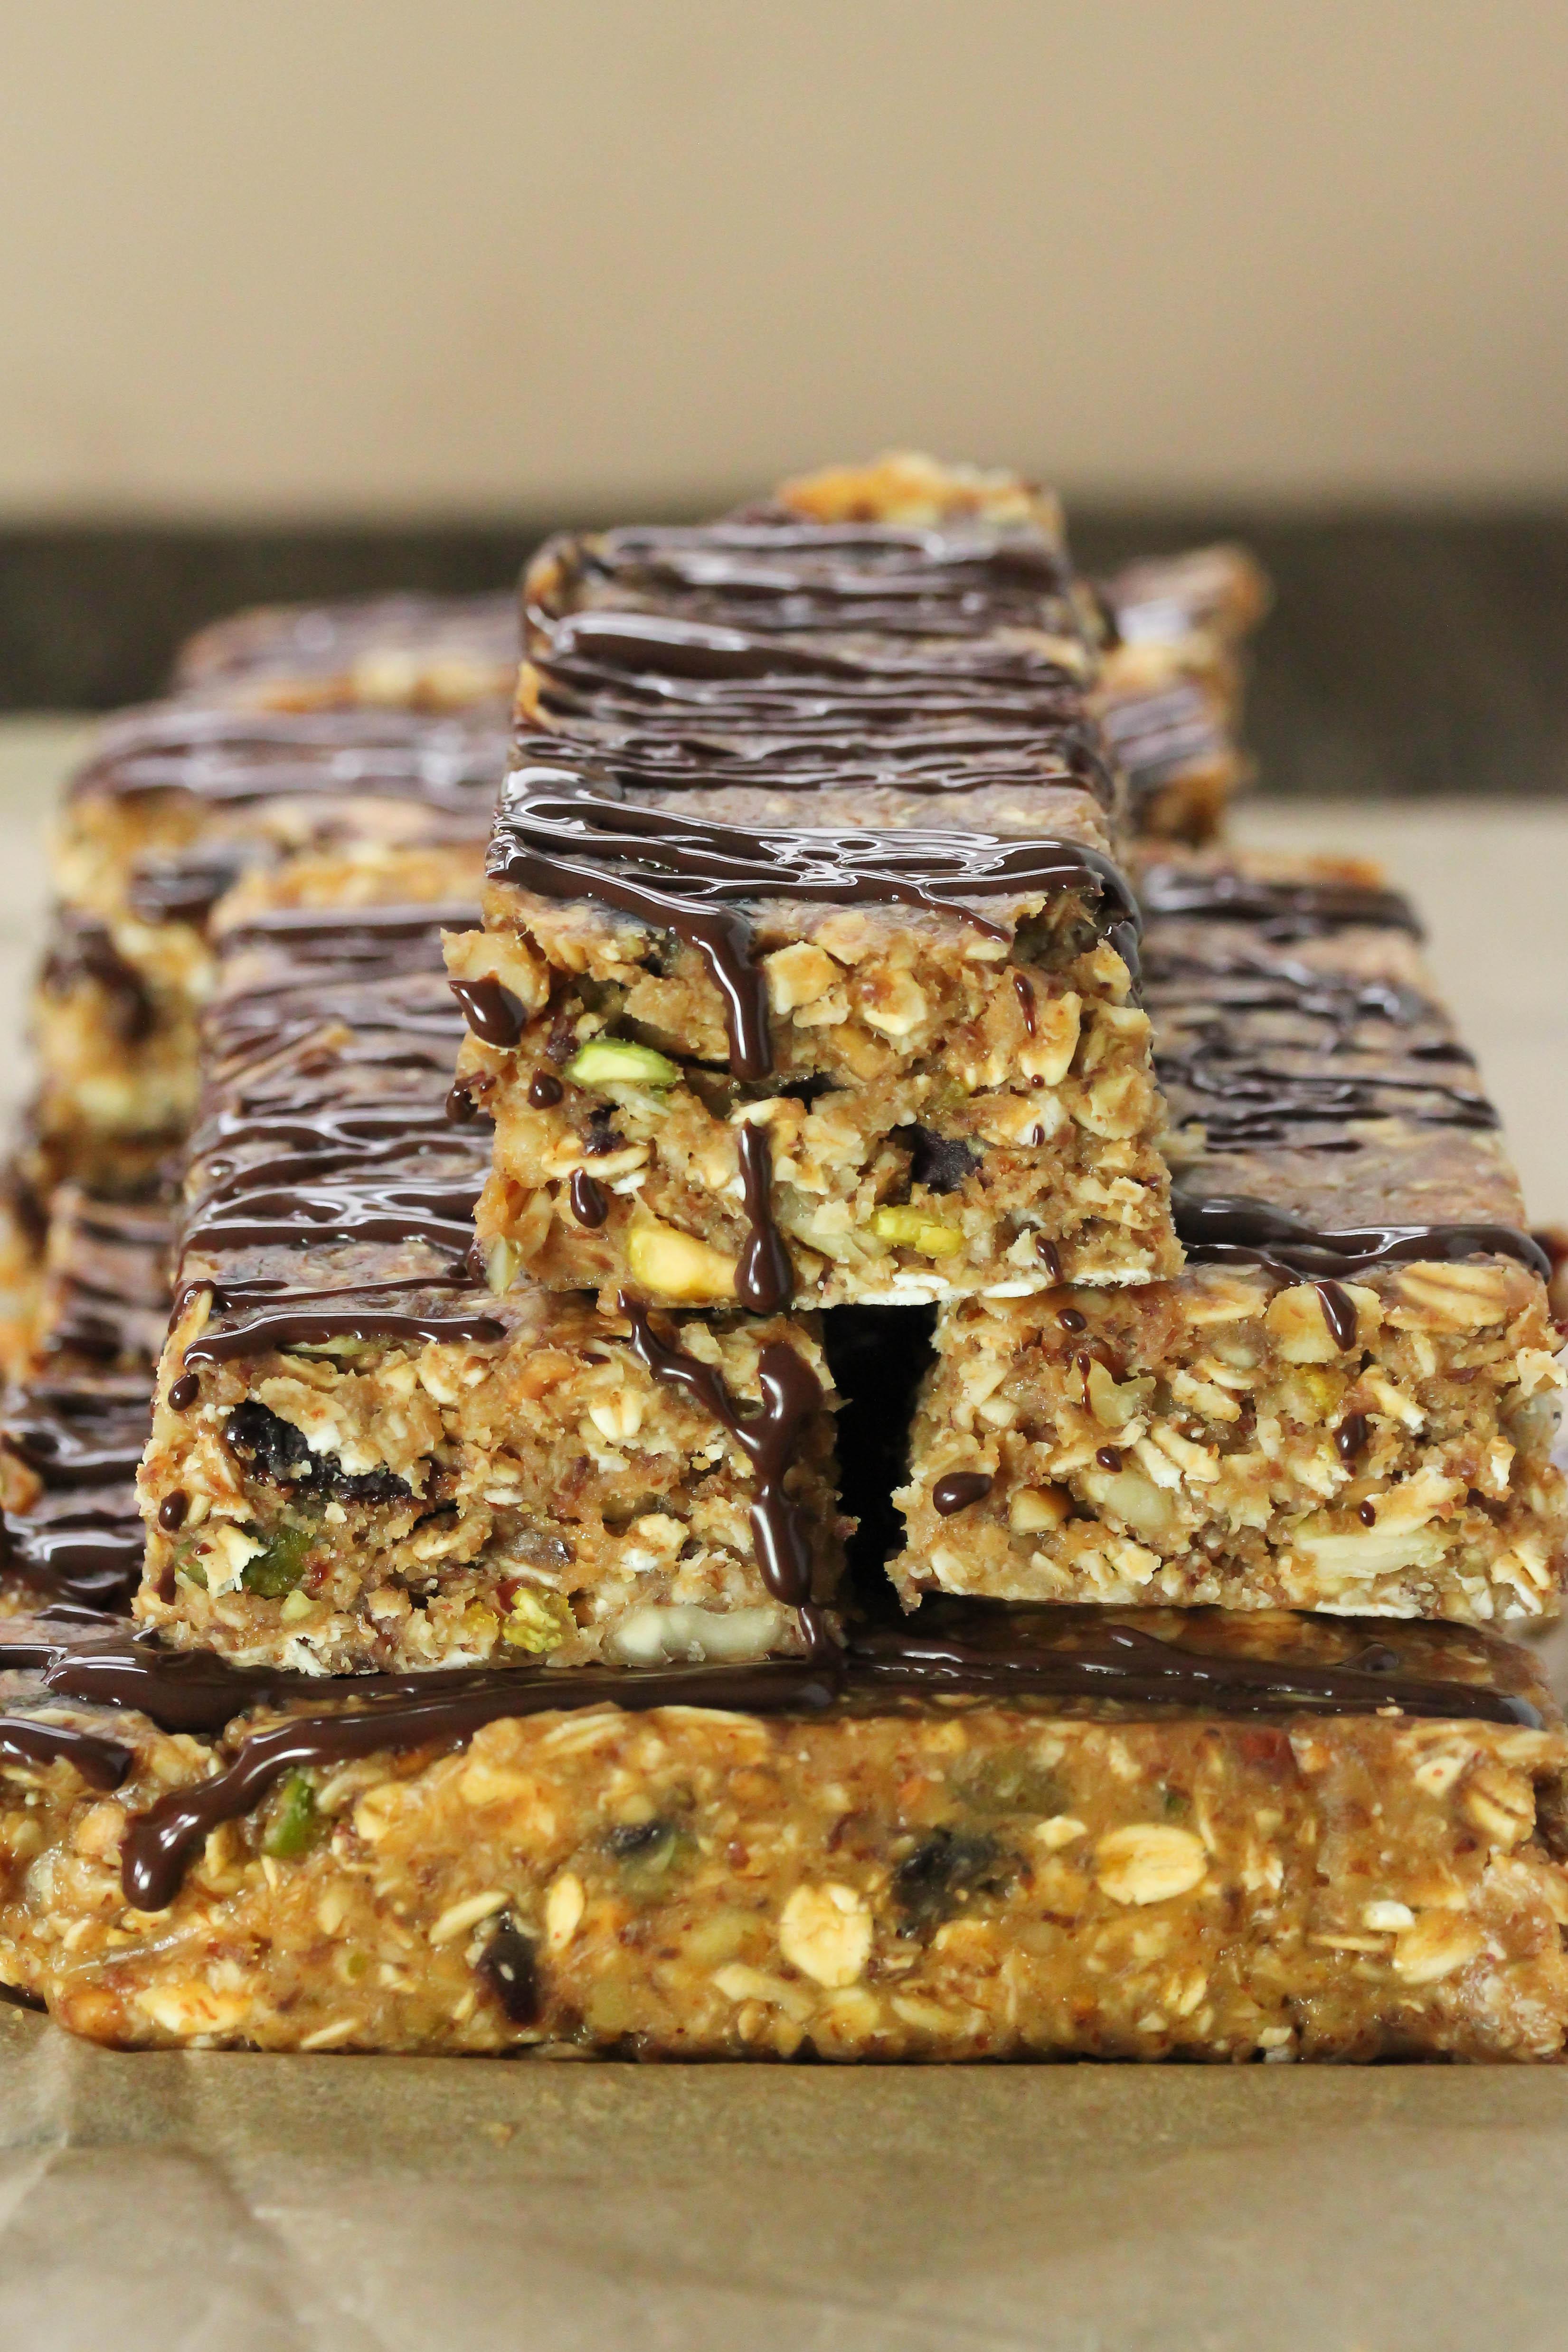 Healthy Breakfast Bars  No bake breakfast bars Gluten free vegan